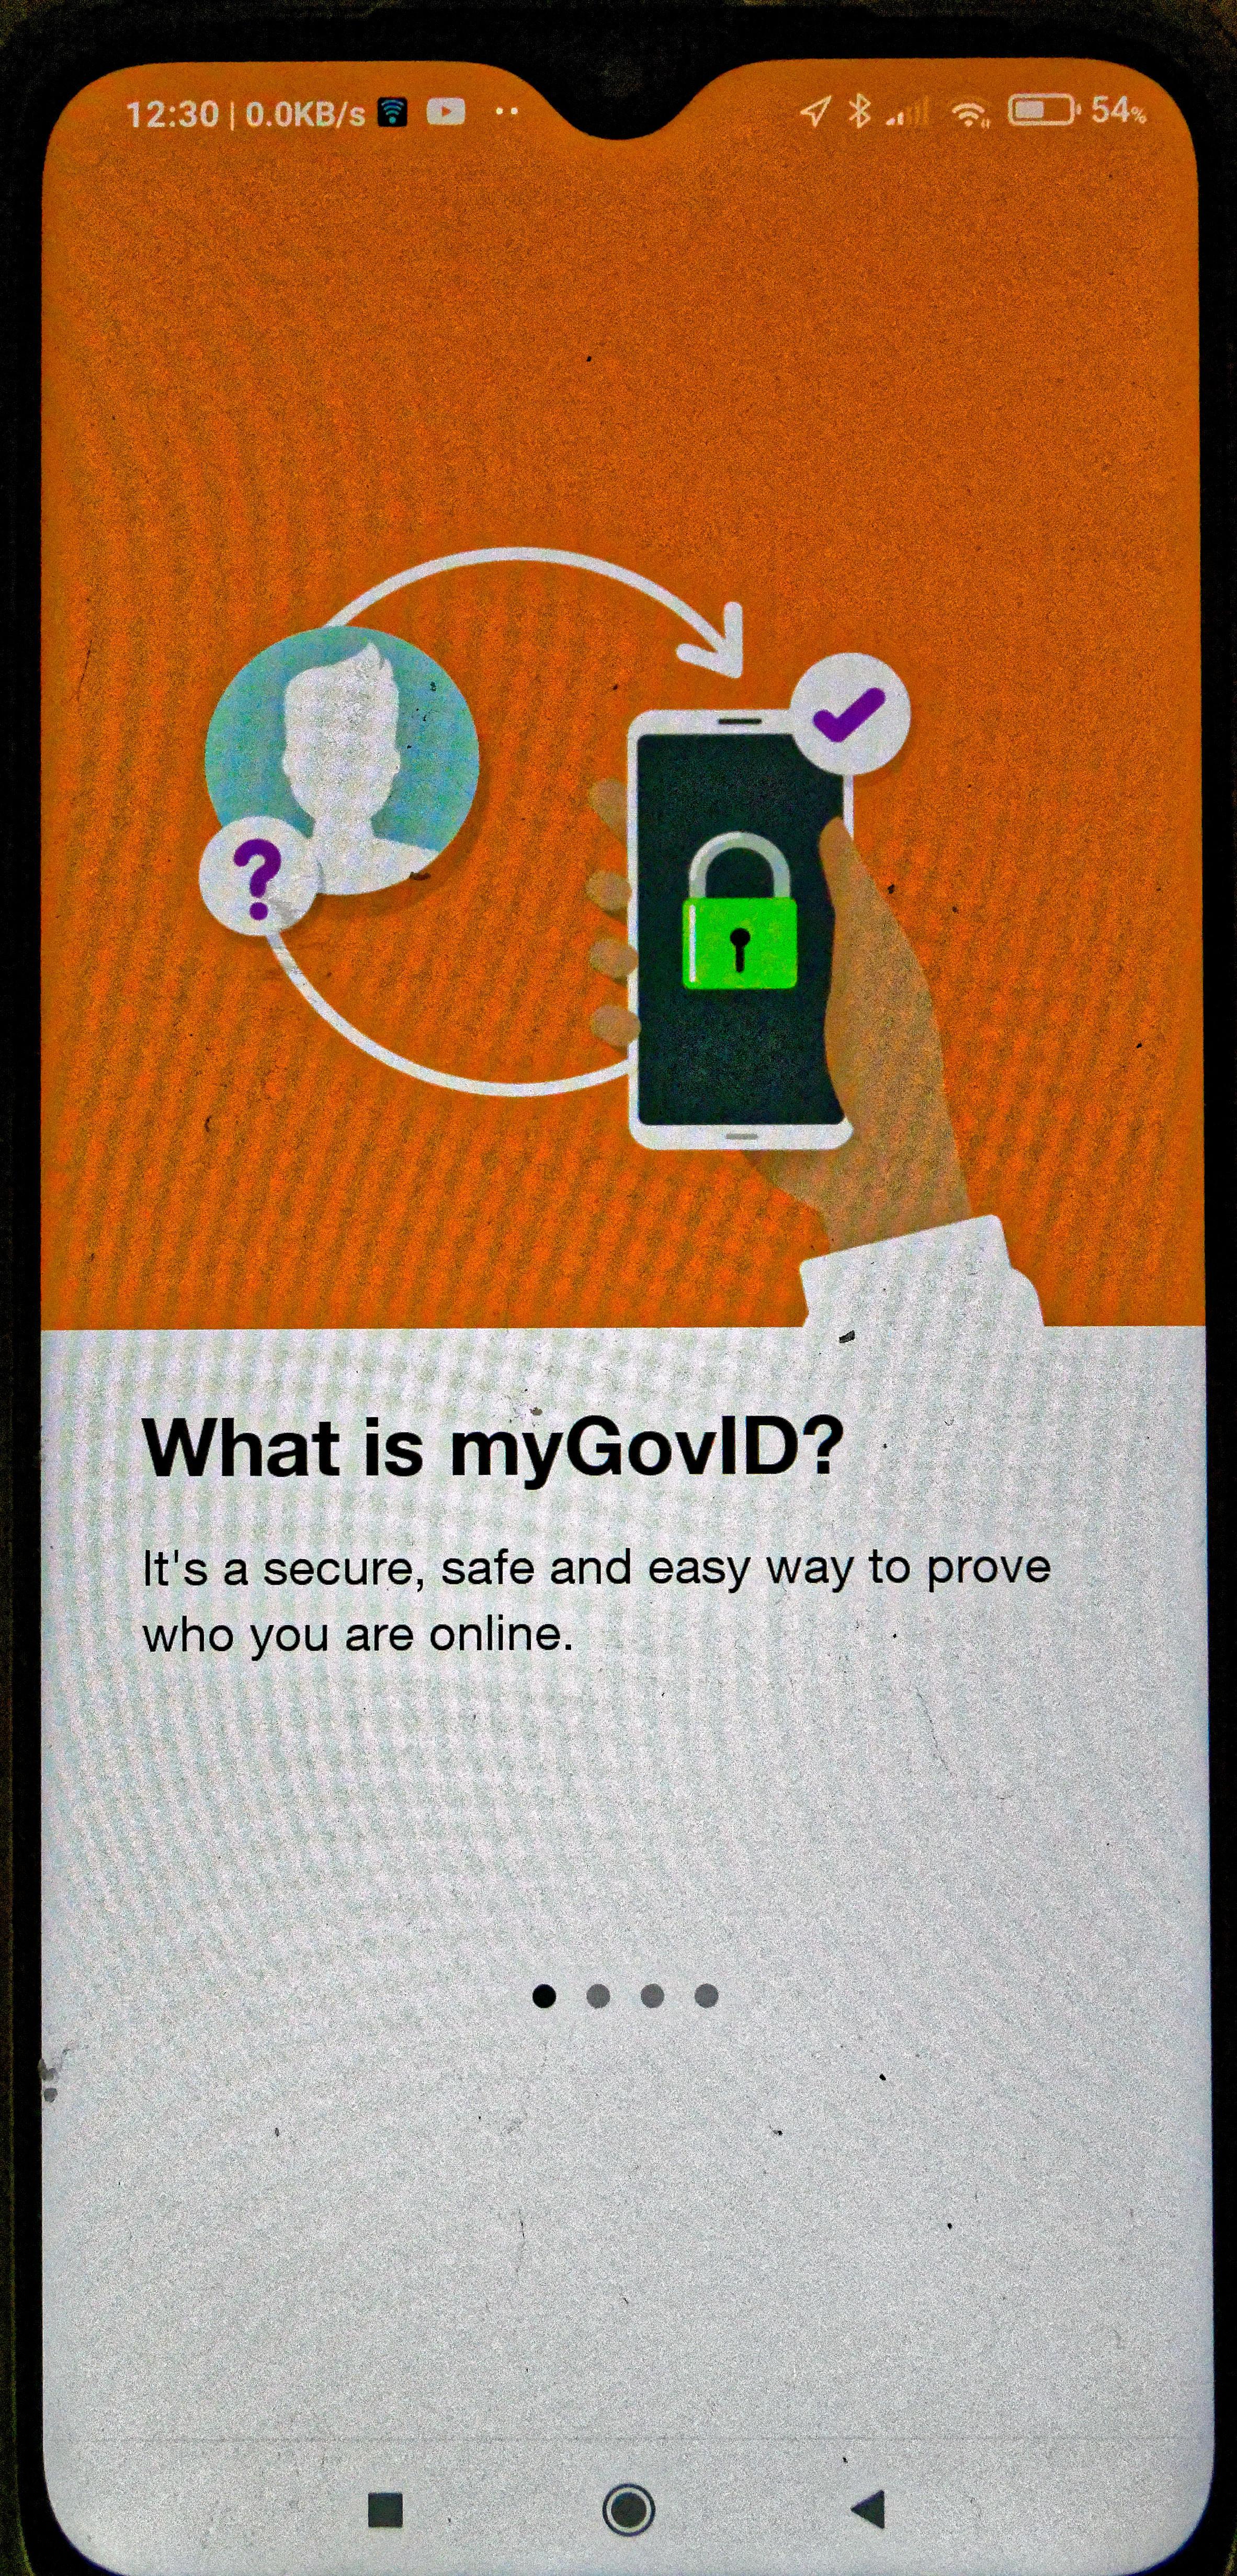 MyGovId-1.jpeg